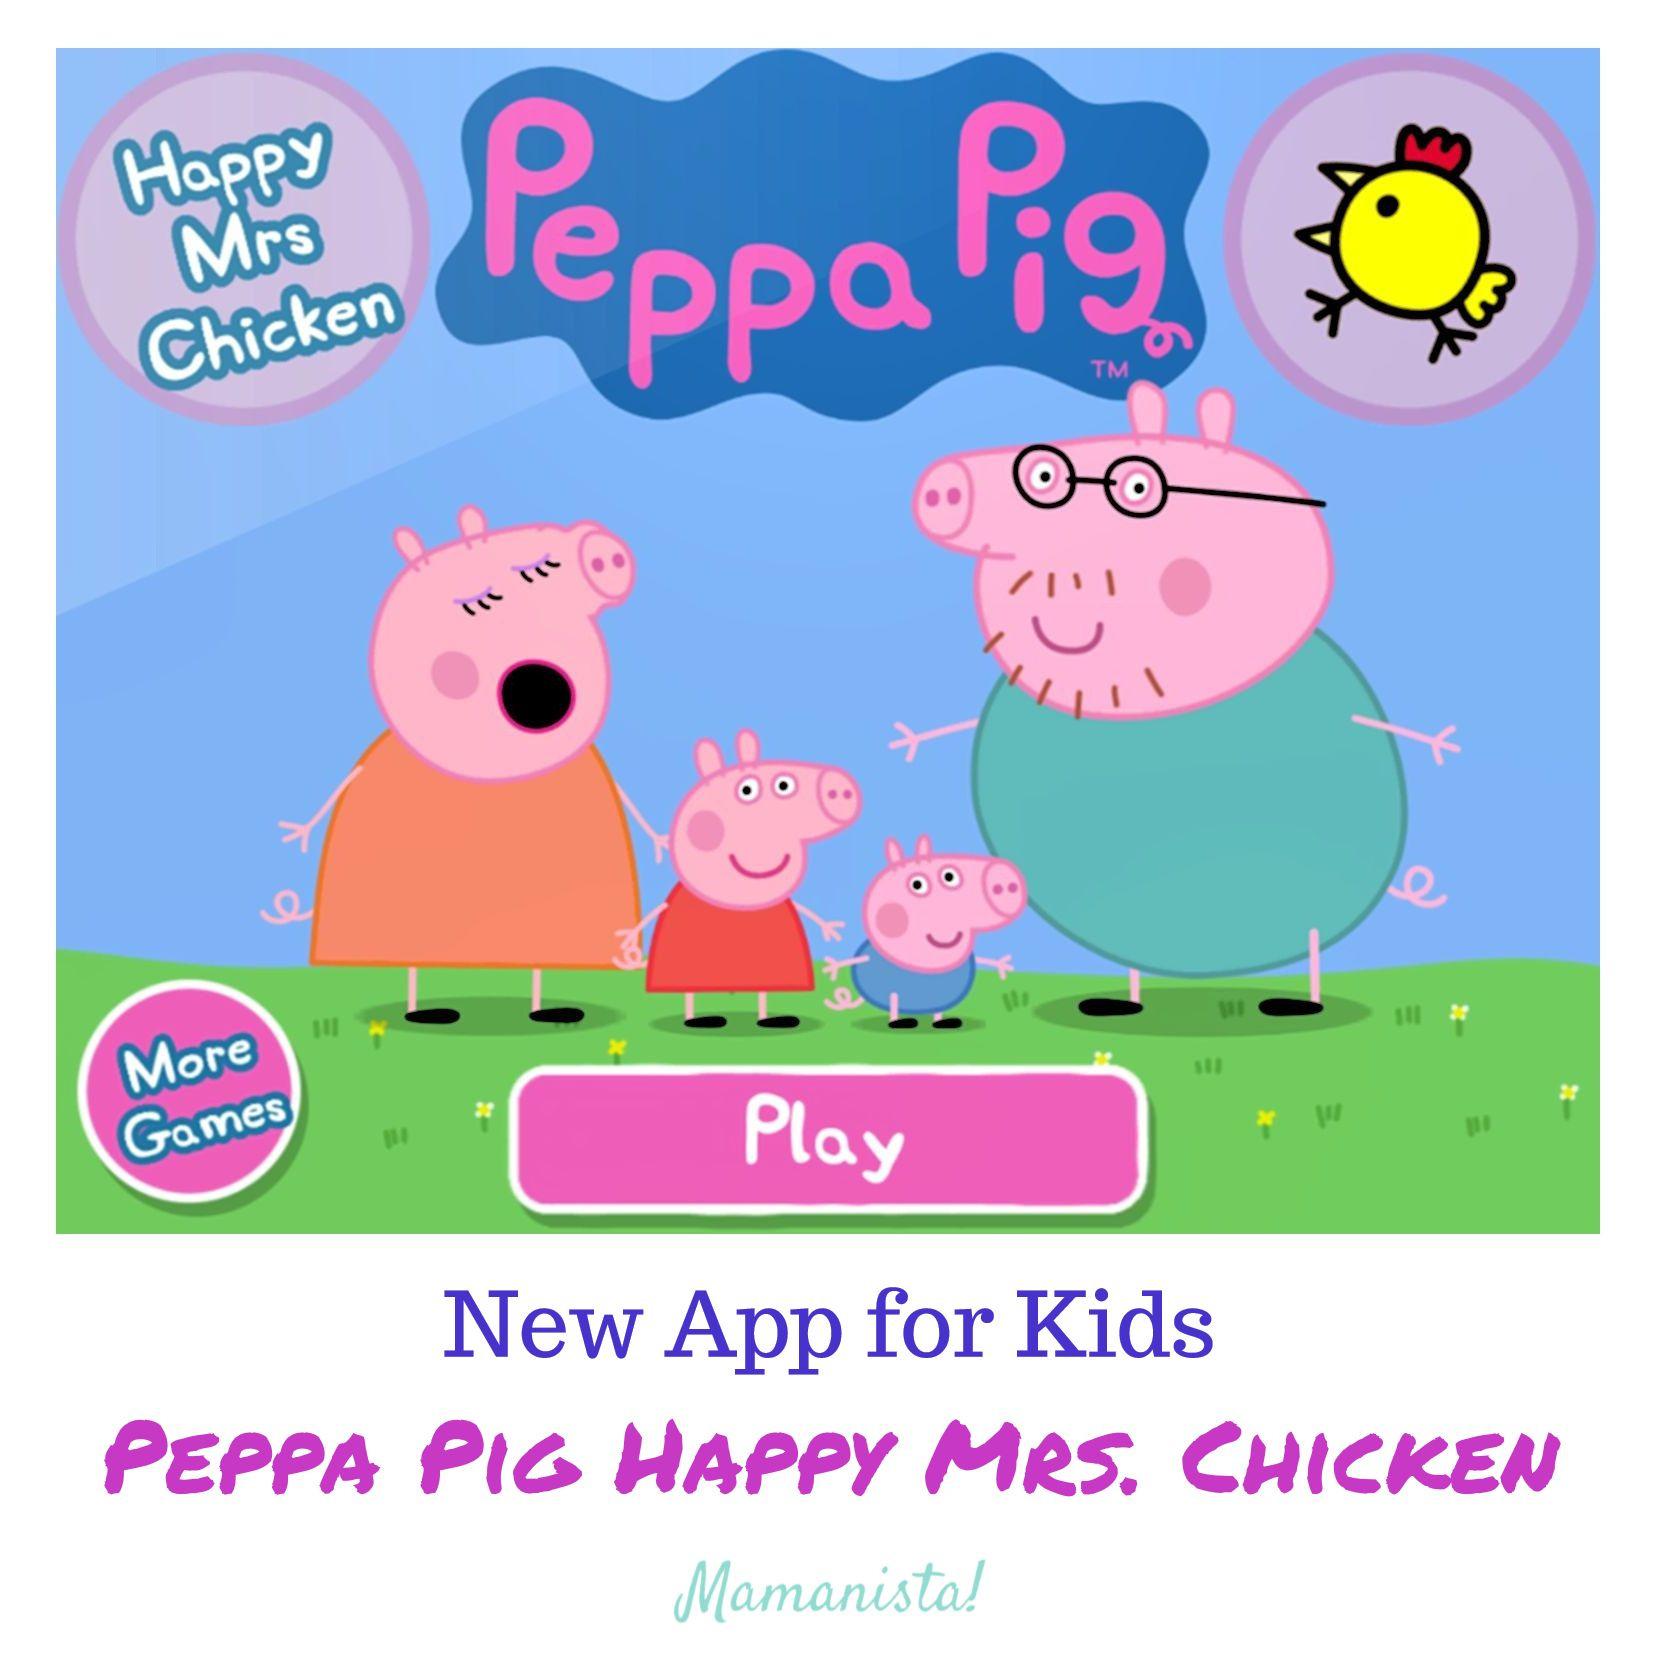 New App for Kids: Peppa Pig Happy Mrs. Chicken